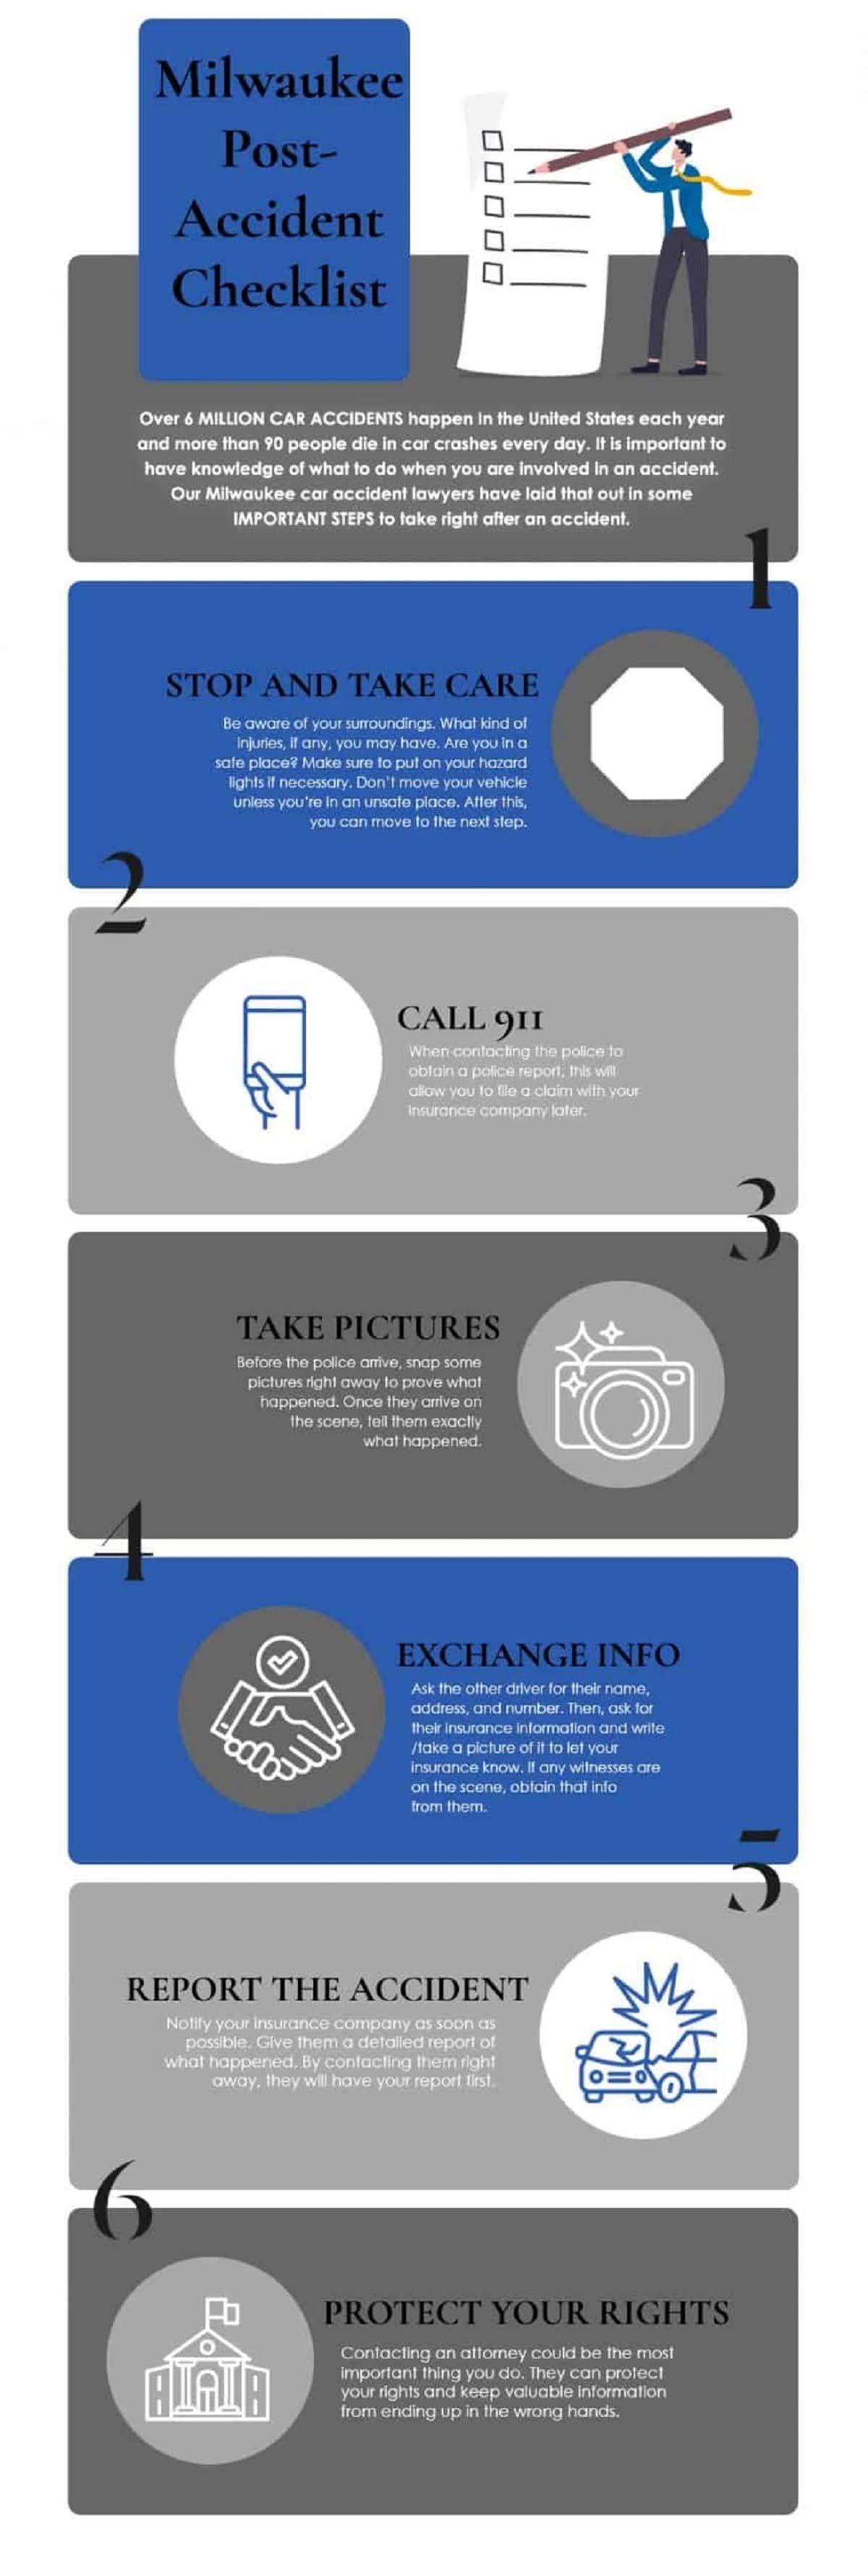 milwaukee-post-accident-checklist-infographic